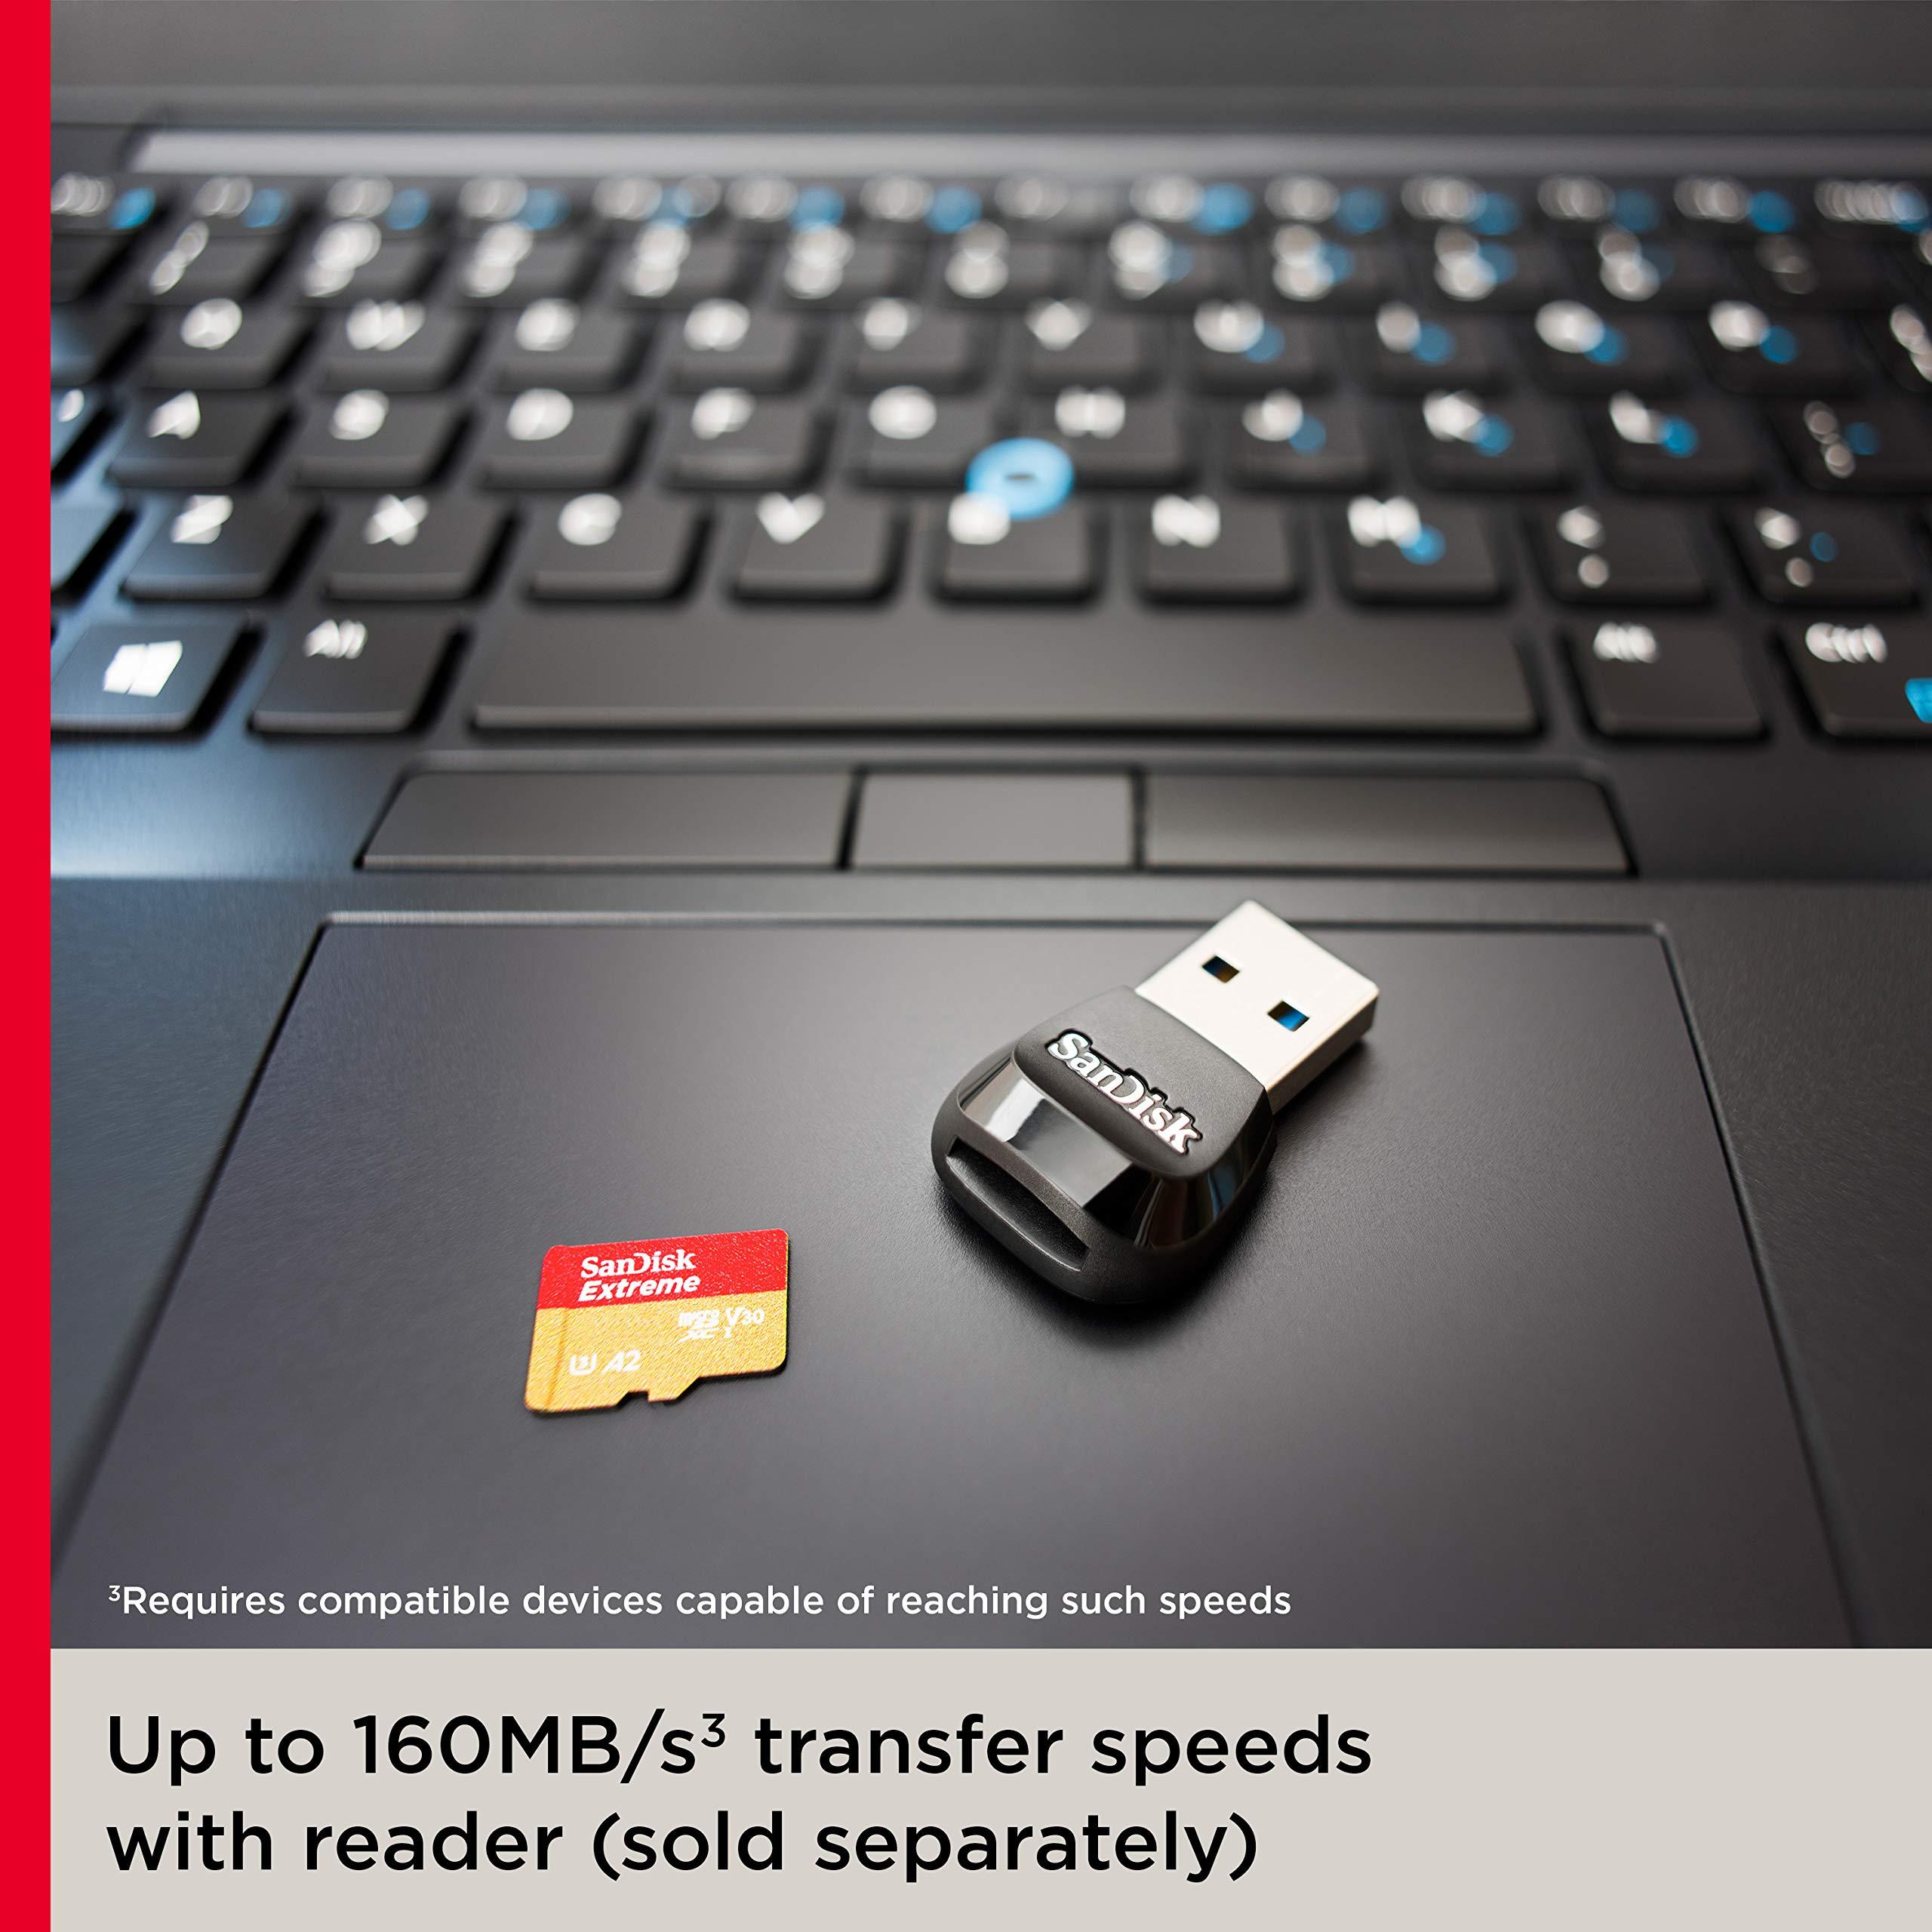 SanDisk 256GB Extreme microSD UHS-I U3 V30 A2 160MB/s- SDSQXA1-256G-GN6MN